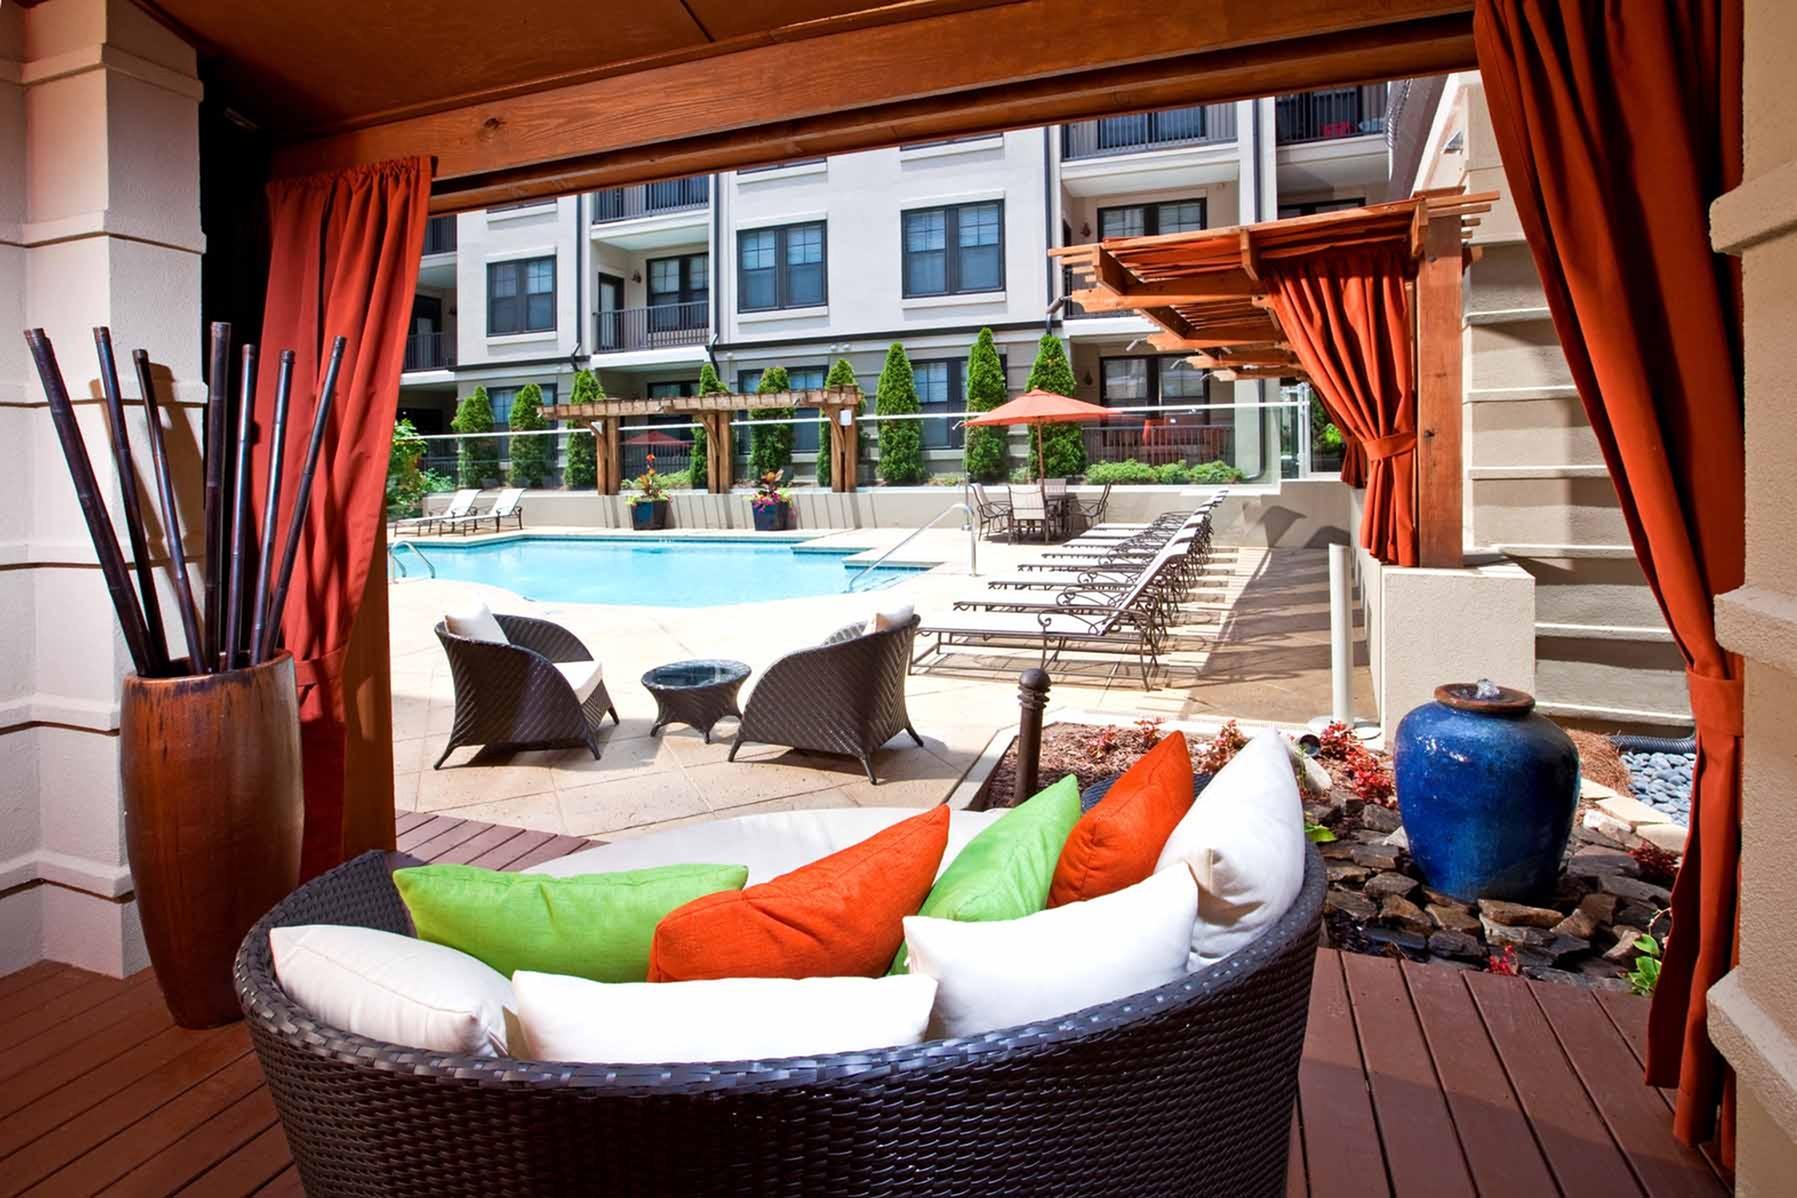 Adorable Amli Lindbergh | Captivating Amli Apartments Atlanta Inspirations